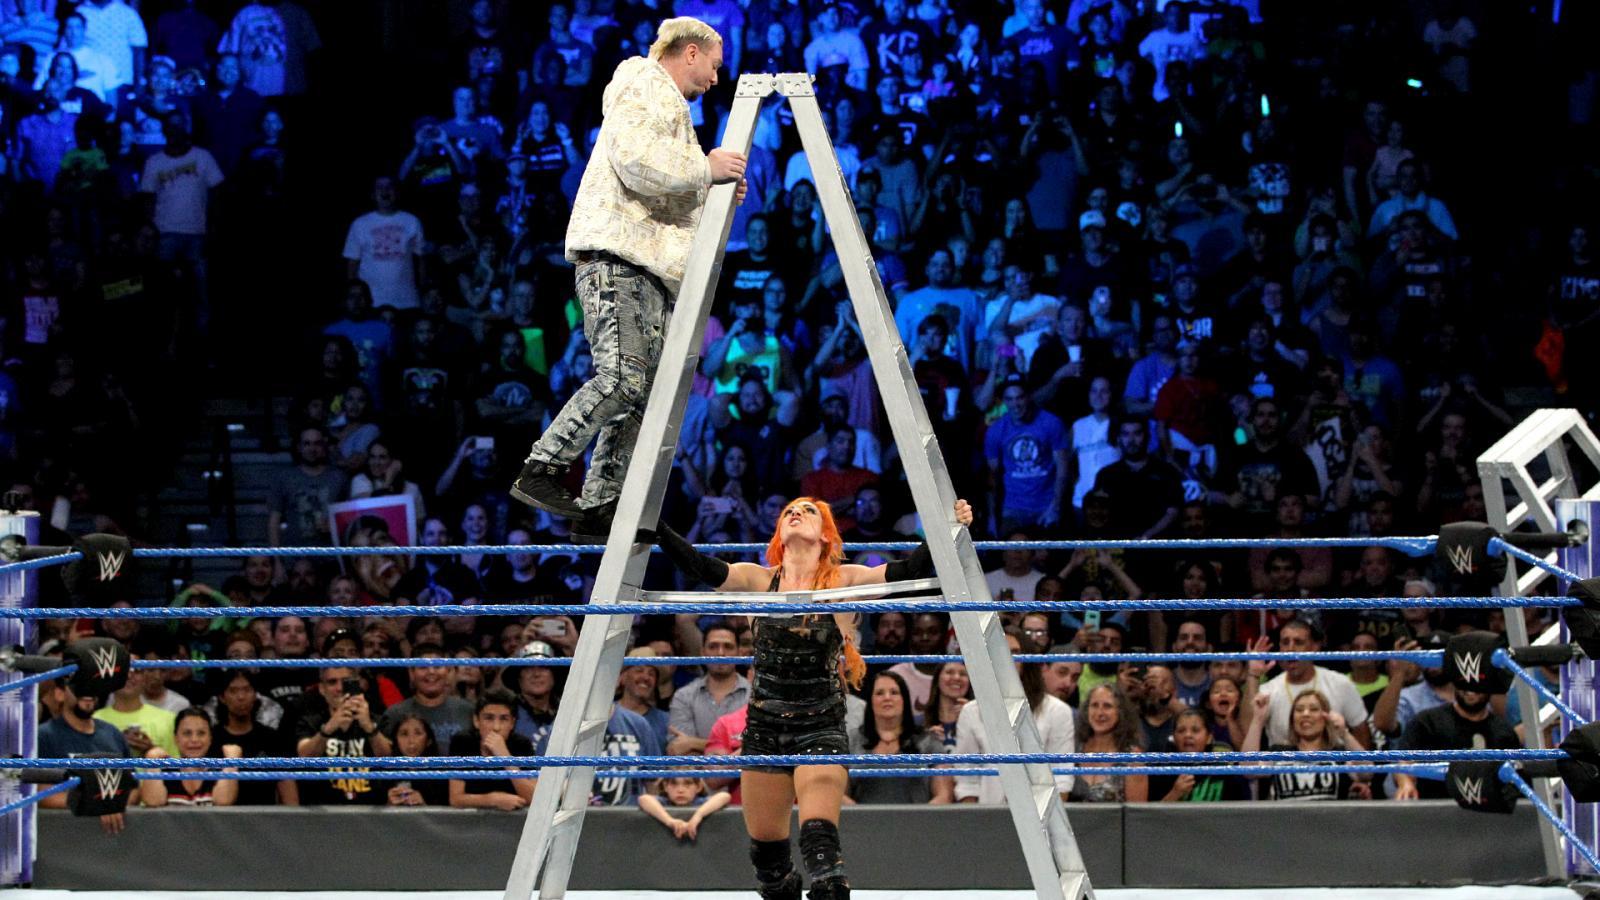 WWE SmackDown रिजल्ट्स : 28 जून 2017 : महिला मनी इन द बैंक का आख़िरकार हुआ फैसला 1